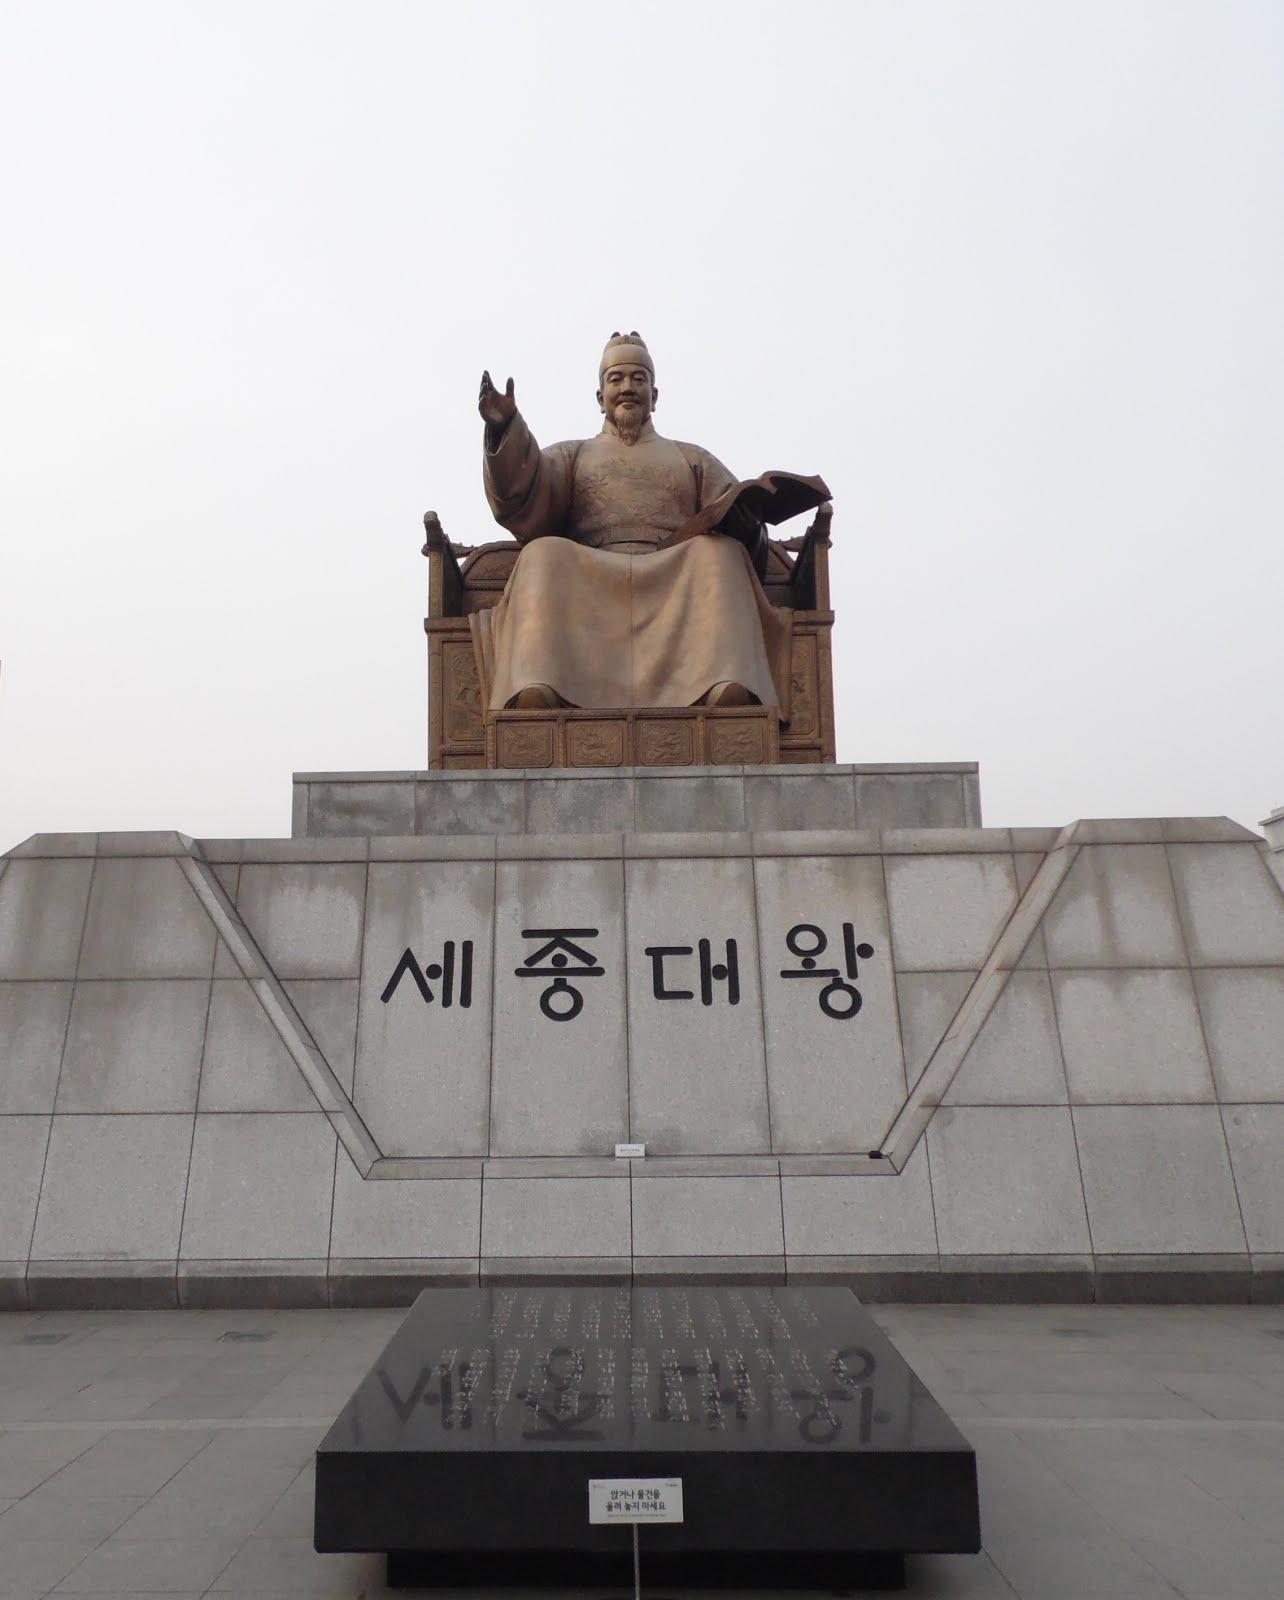 Gwanghwamun Square - King Sejong statue